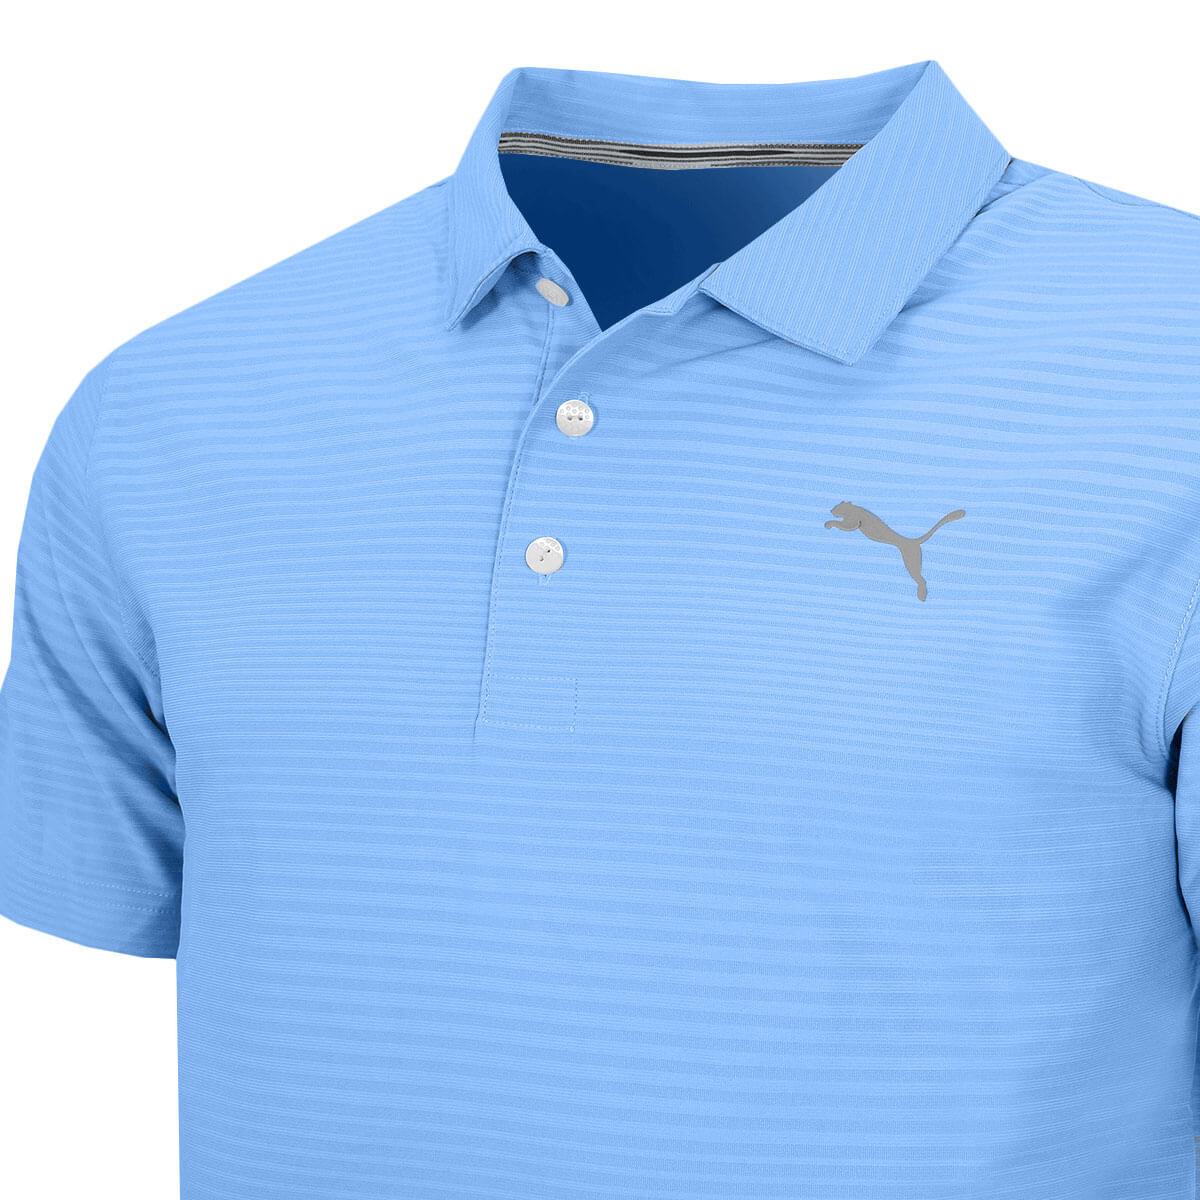 Puma-Golf-Mens-Aston-DRYCELL-UPF-50-Moisture-Wicking-Polo-Shirt-45-OFF-RRP thumbnail 7